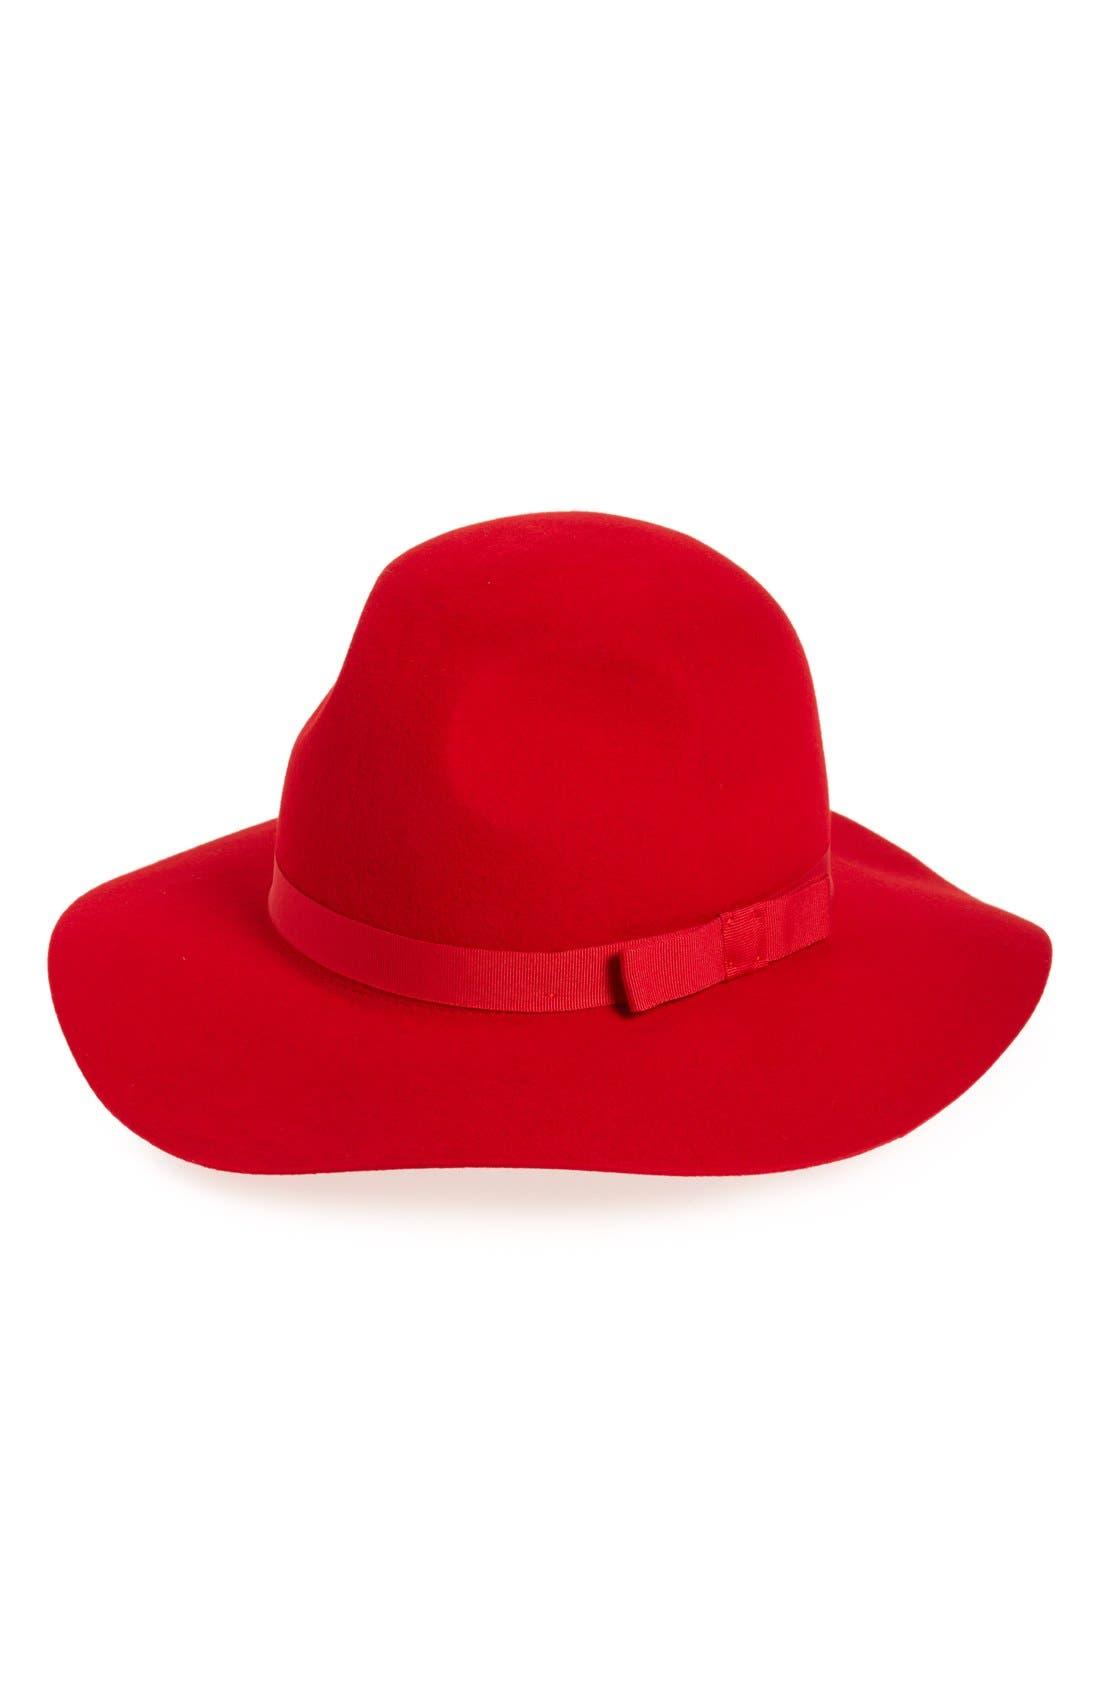 Alternate Image 1 Selected - Brixton 'Dahlia' Floppy Brim Wool Hat